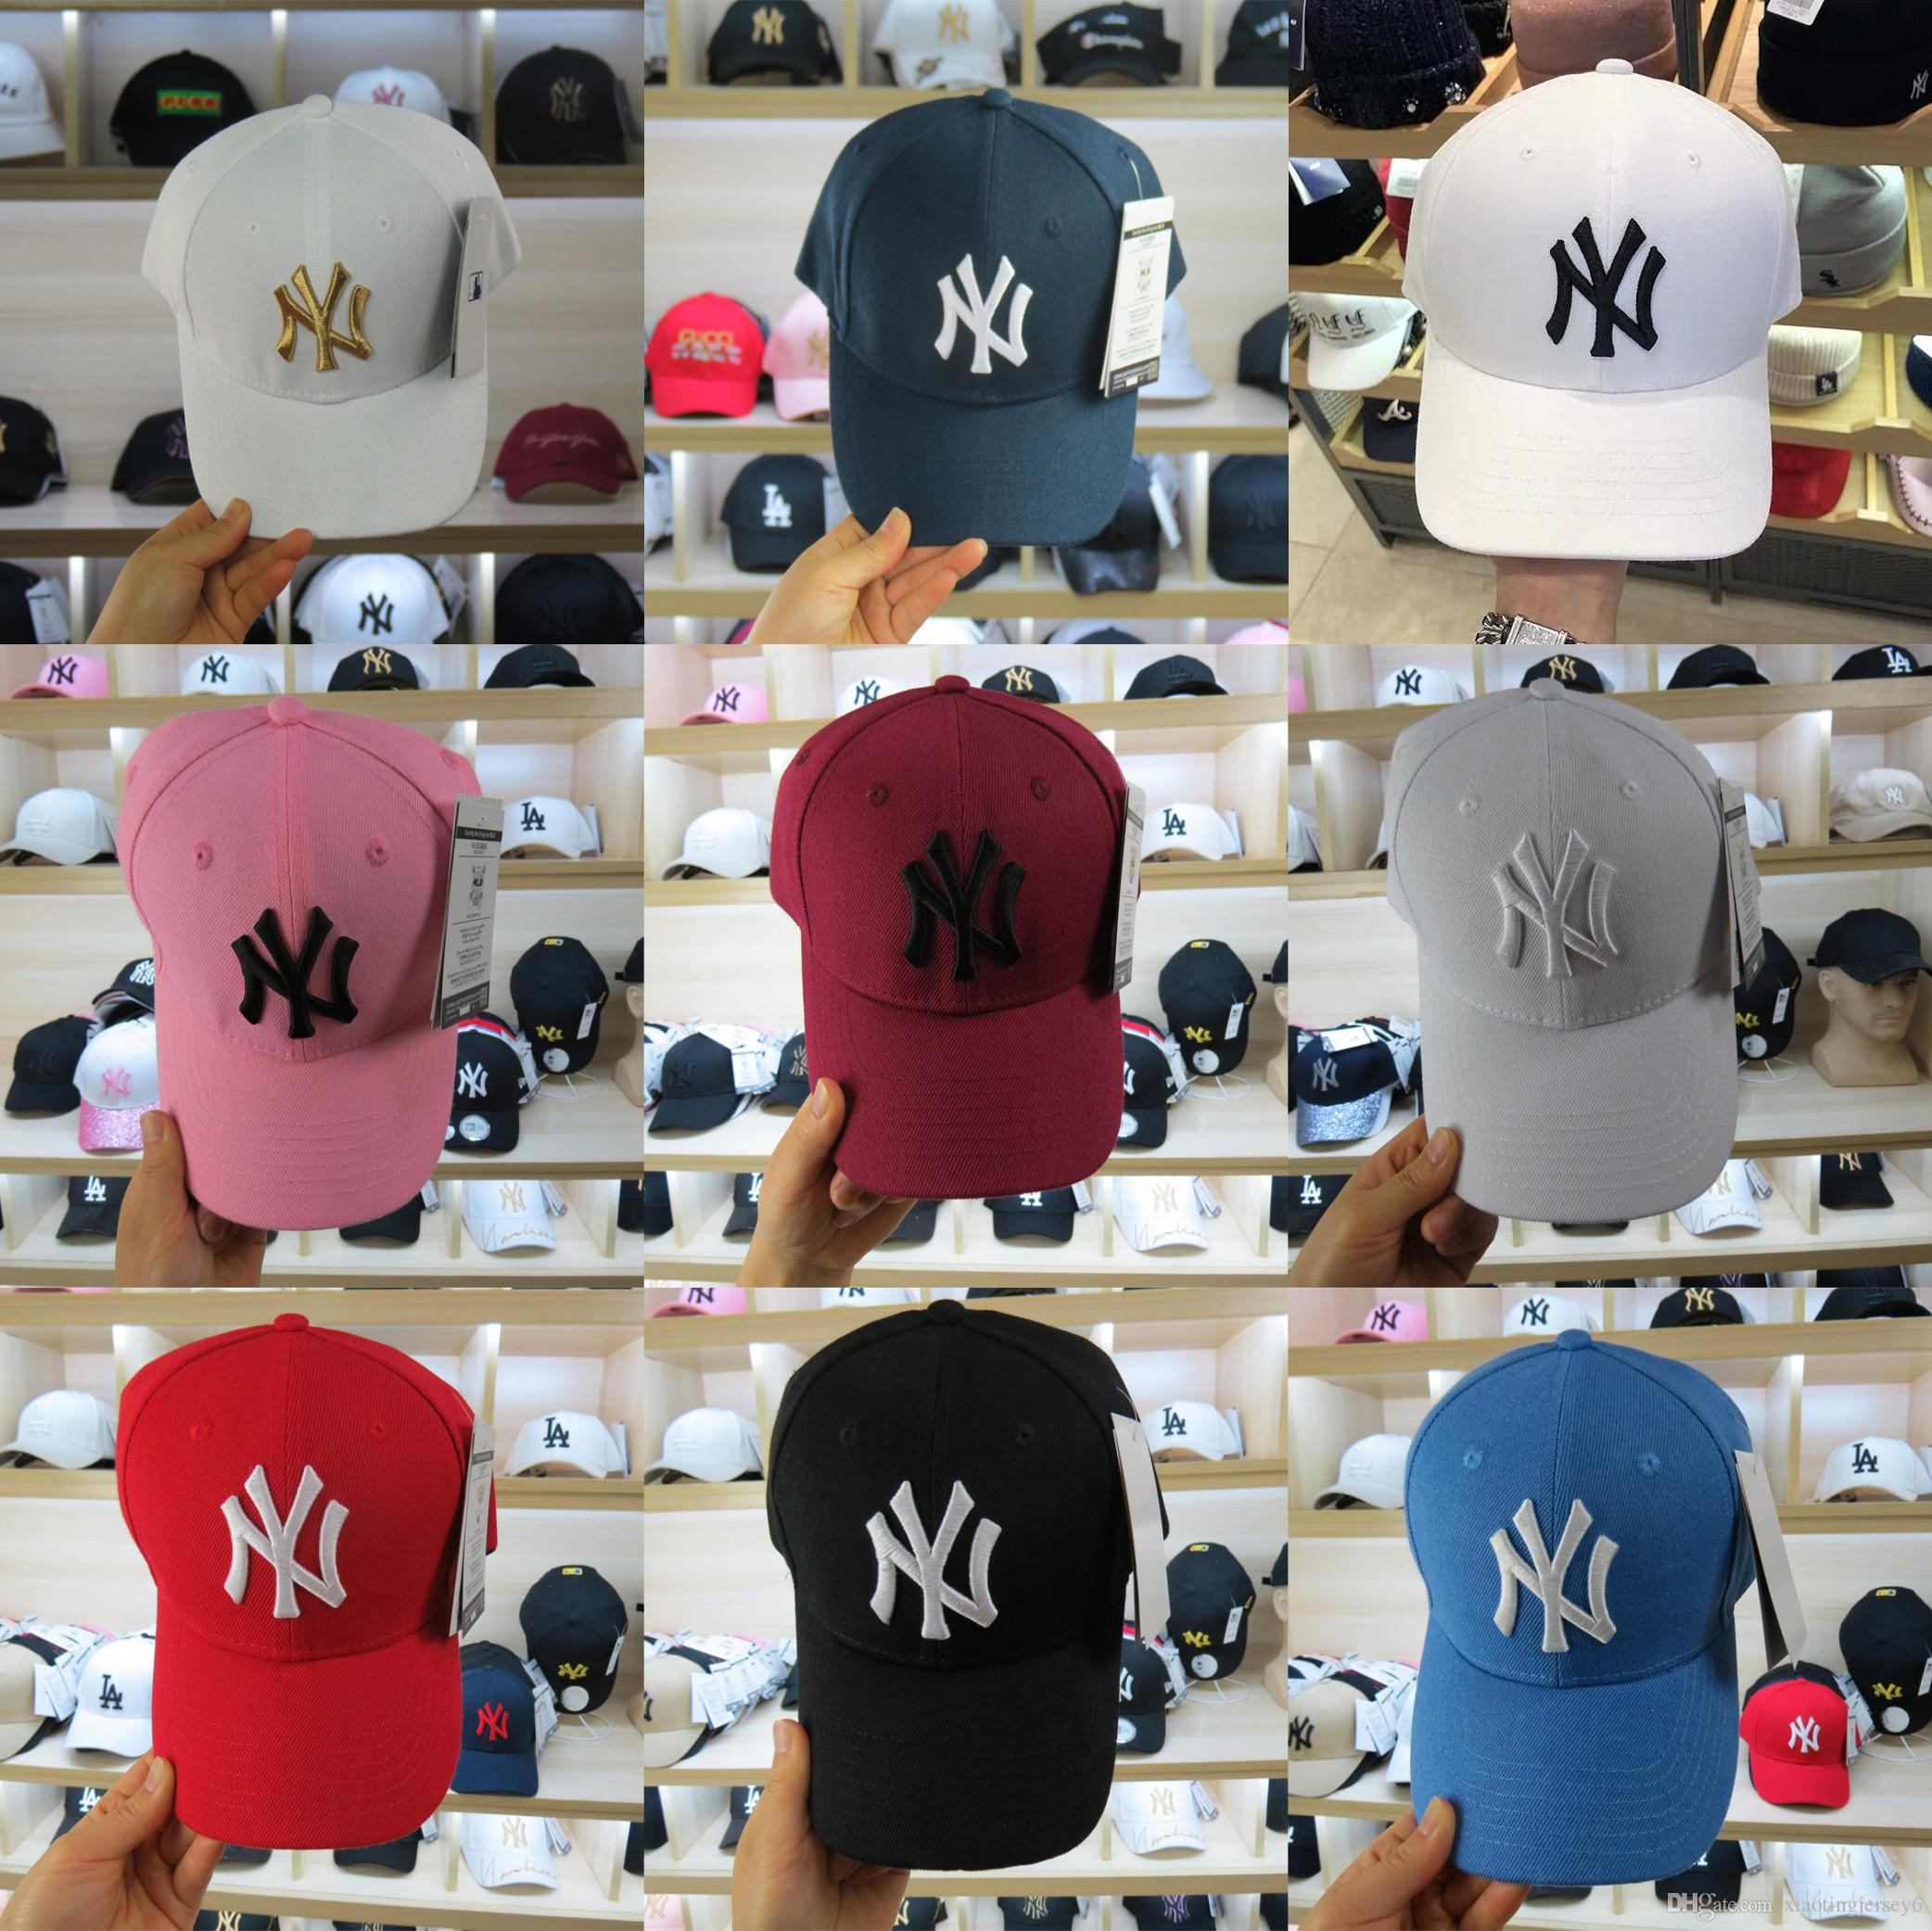 96c7a4ccf8a68 2019 New York Wholesale High Quality NY Yankees Fade Baseball Caps ...